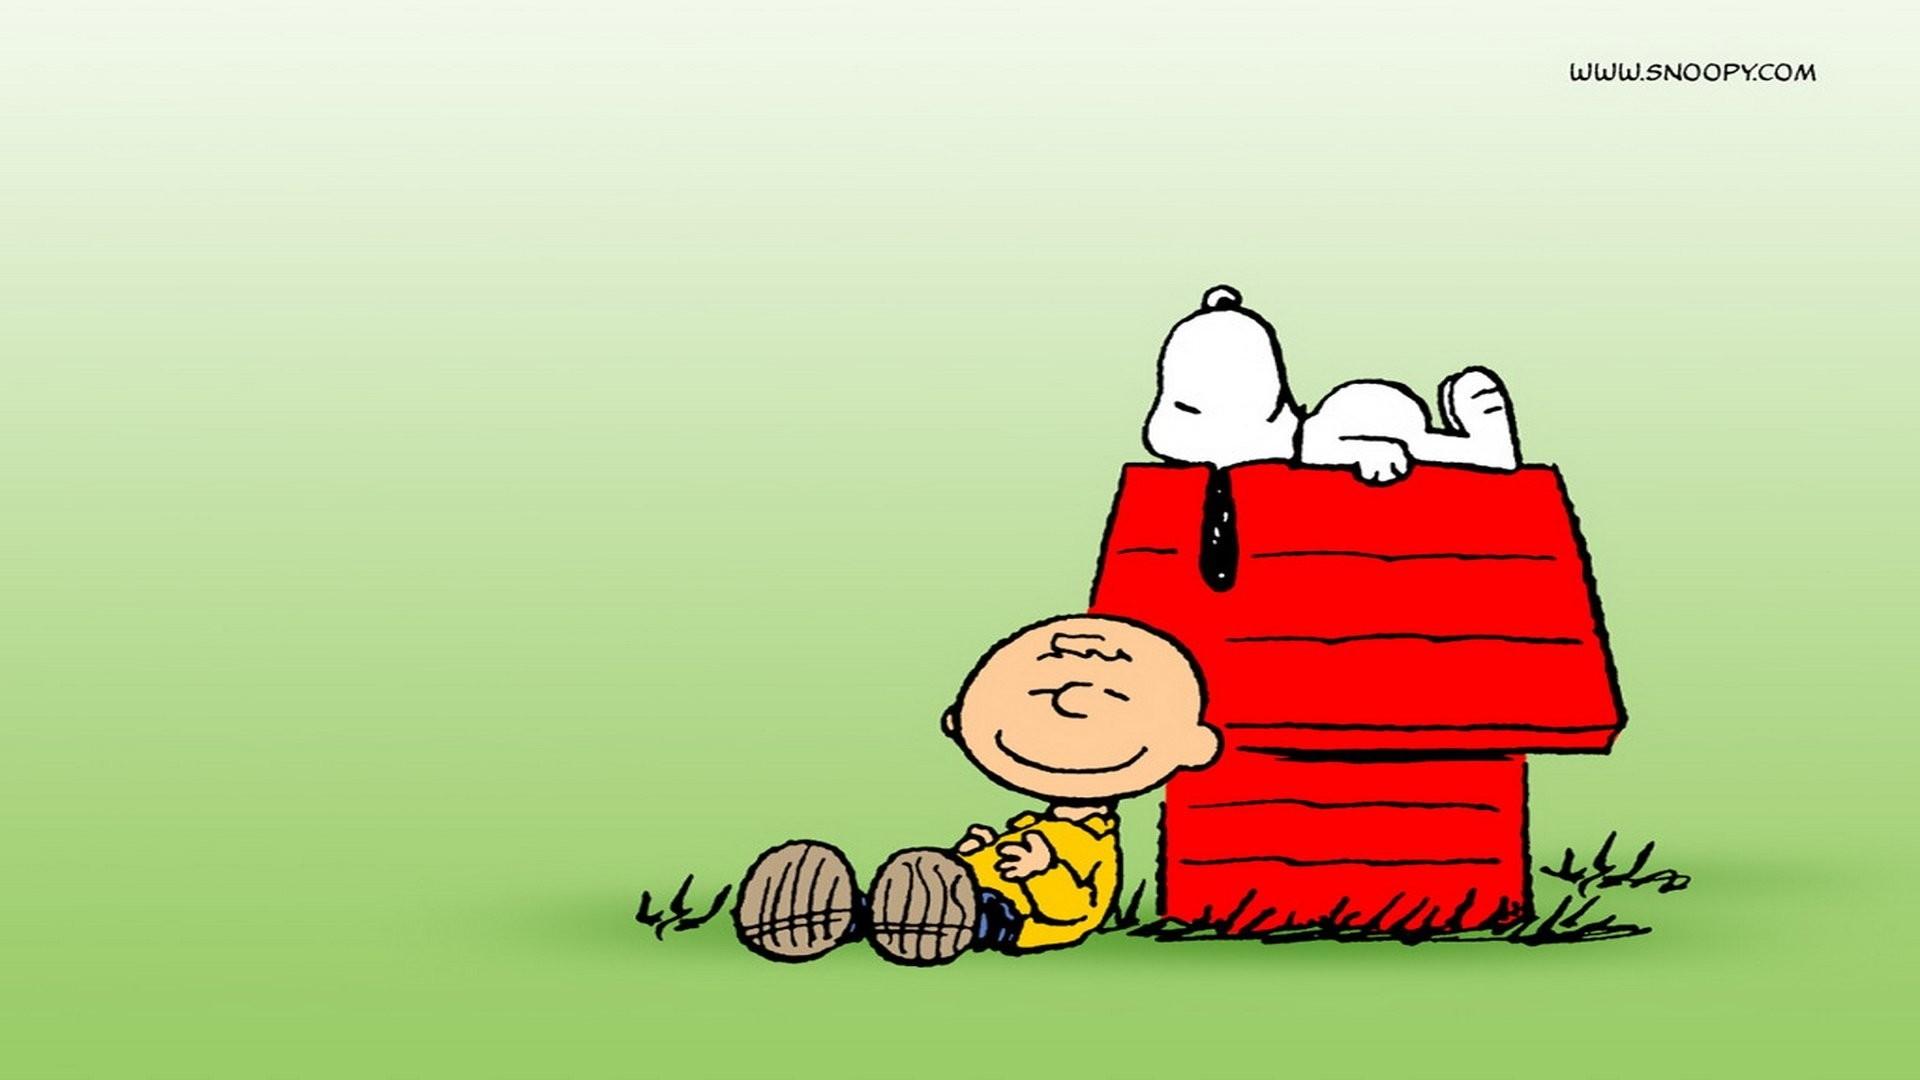 Snoopy Halloween Wallpaper 45 Pictures